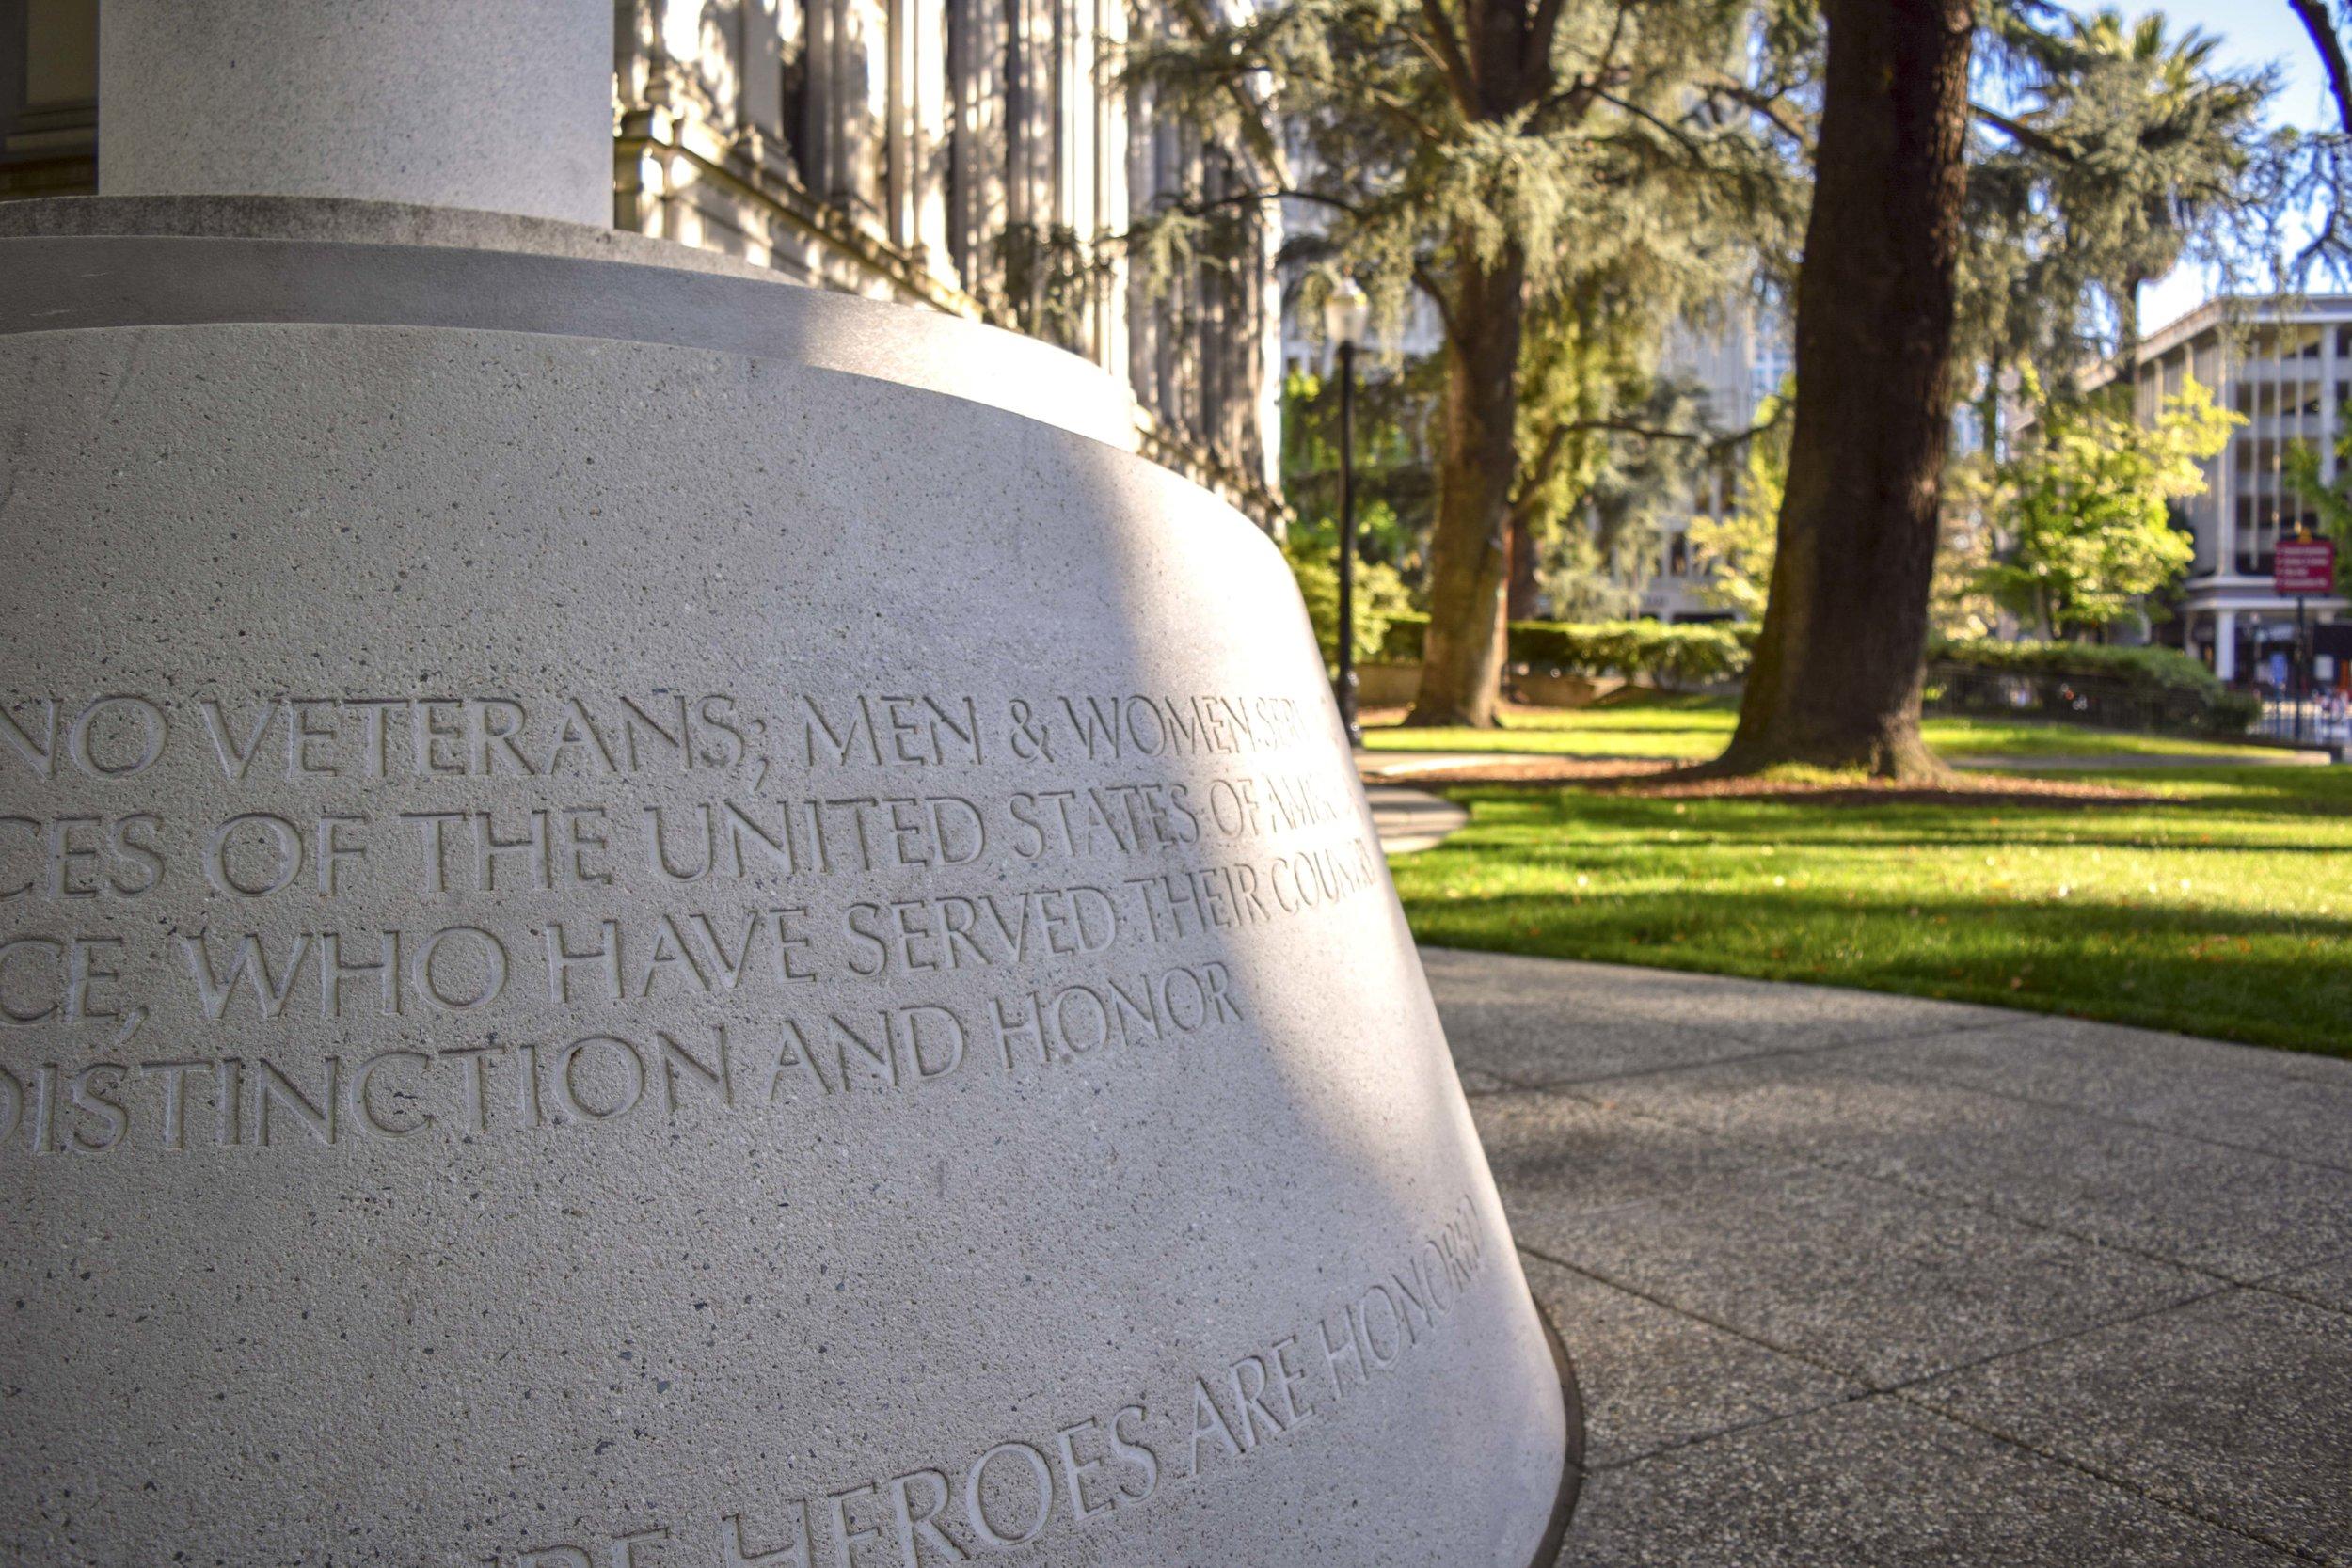 20180420 Mexican American Veterans Memorial_Quad (17) web.jpg